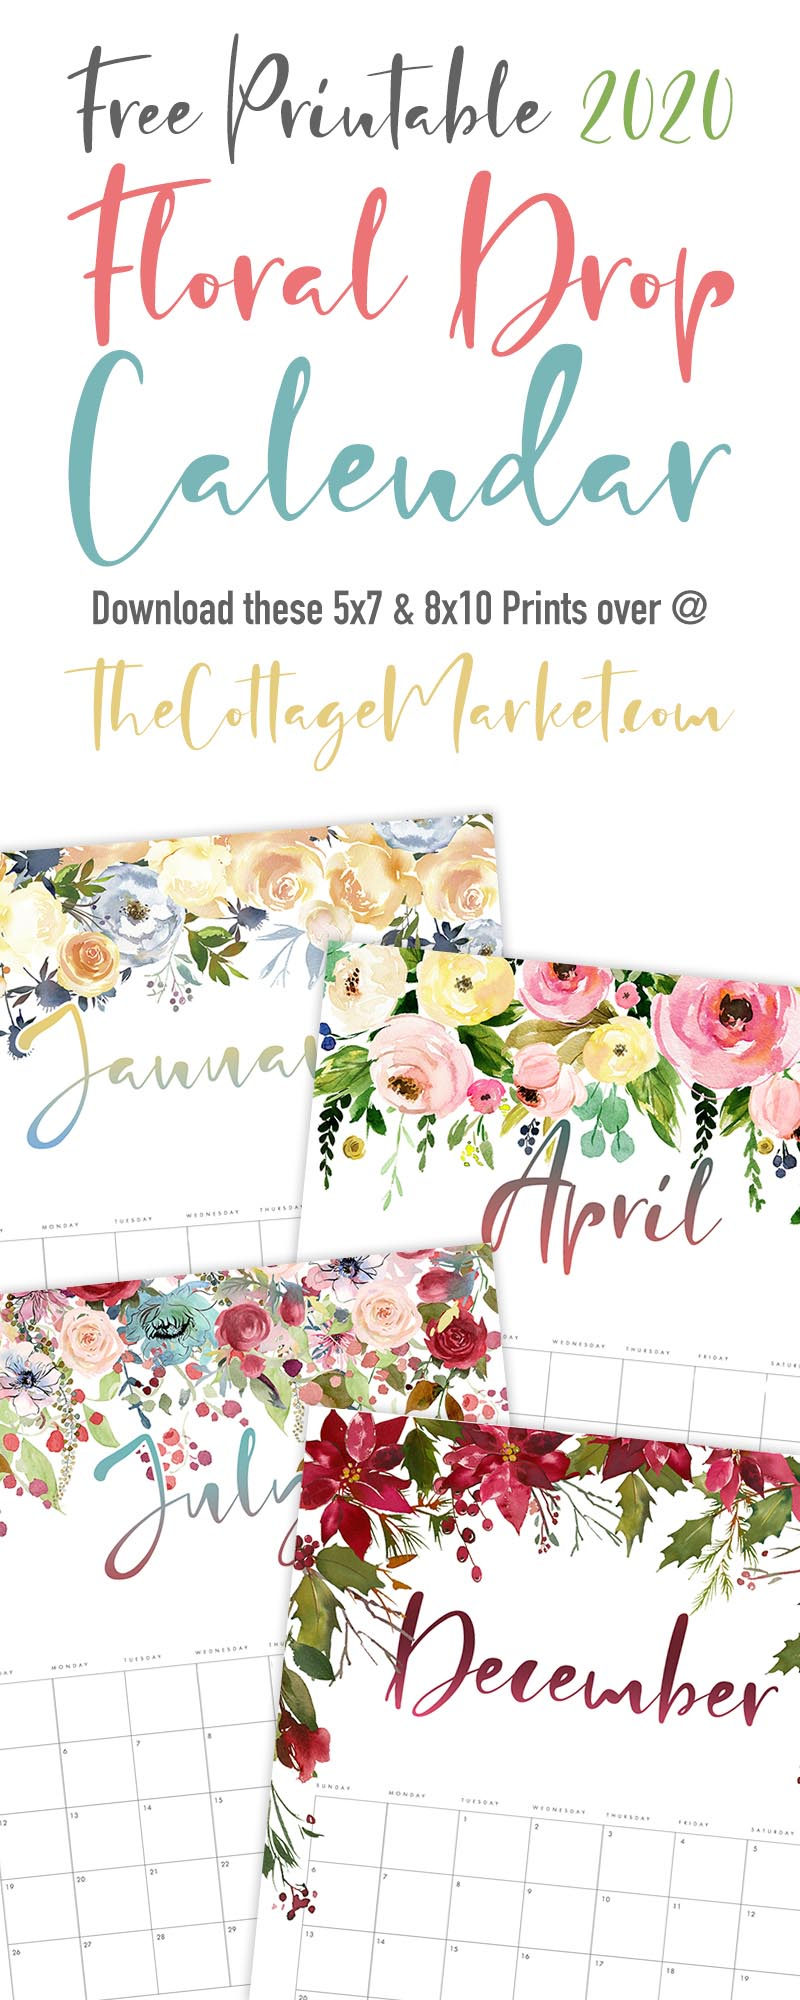 https://thecottagemarket.com/wp-content/uploads/2020/10/TCM-FloralDrop-Calendar-2021-t-1.jpg